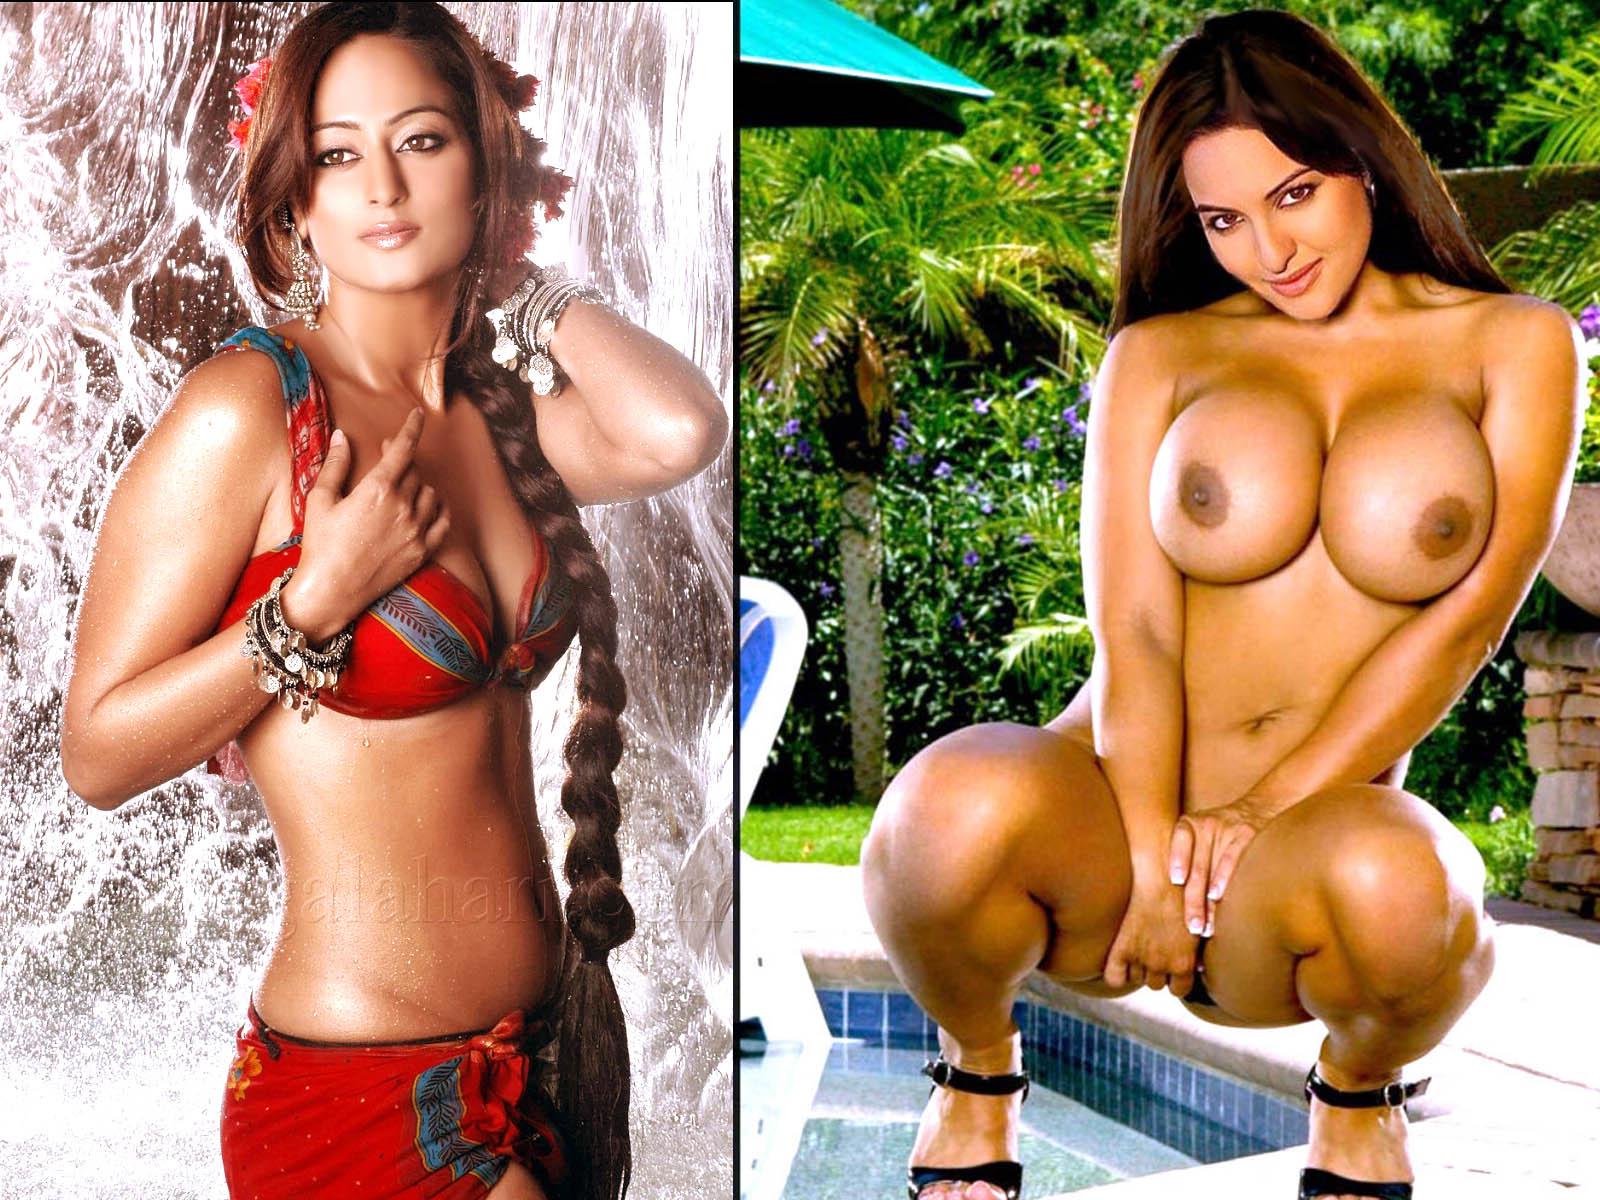 Richa Gangopadhyay Nude And Se Sonakshi Sinha Wallpaper